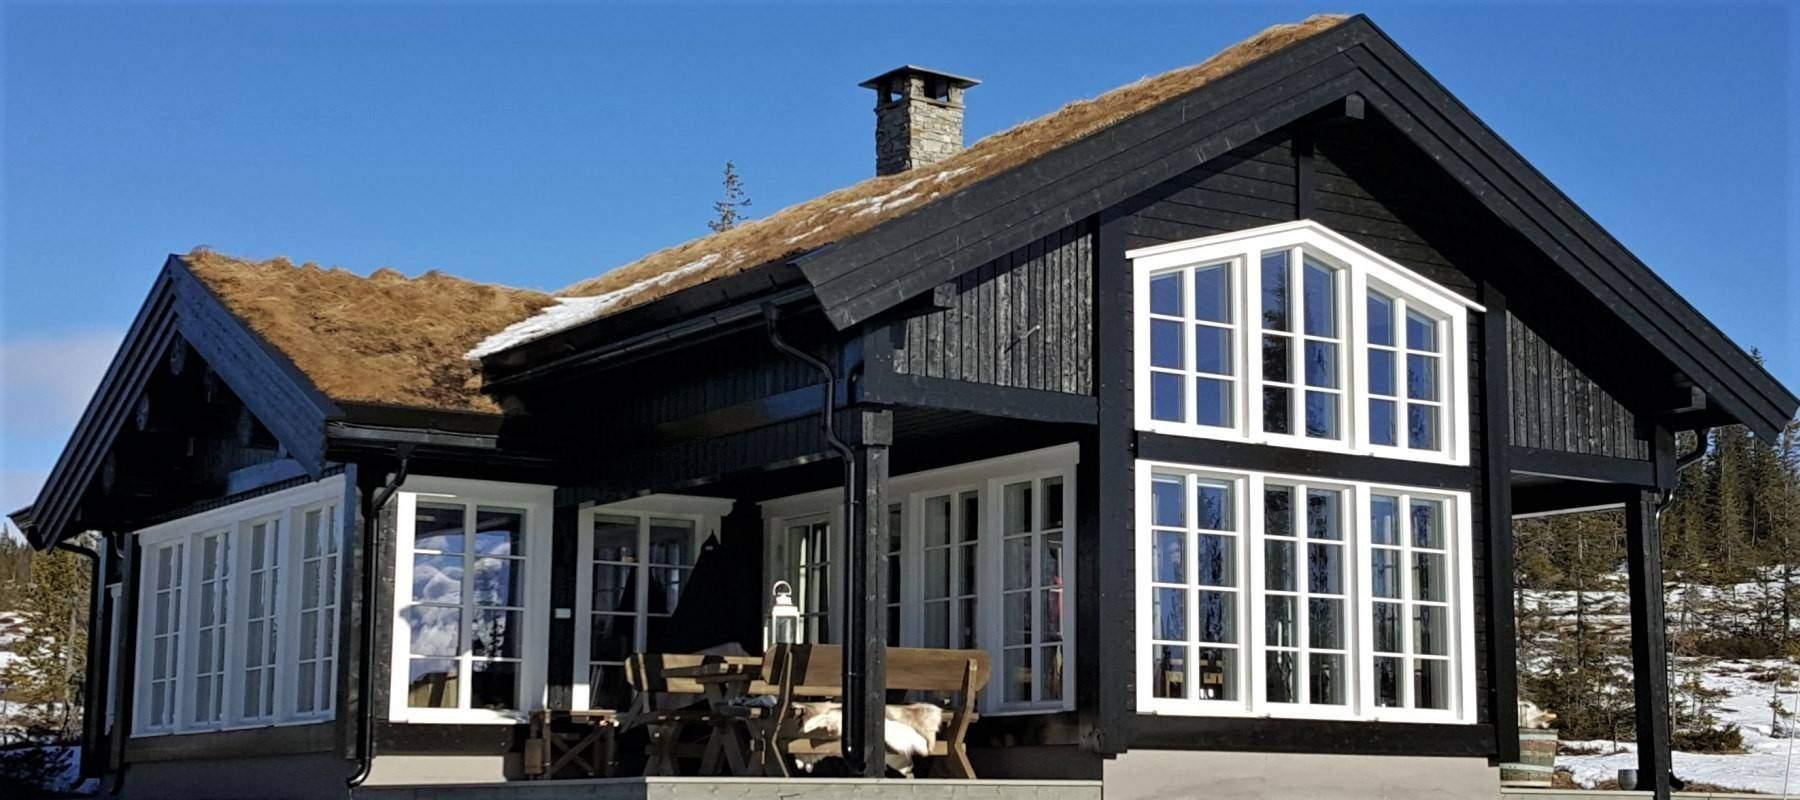 2200 Hytte hytteleverandør Veggli Stryn 92